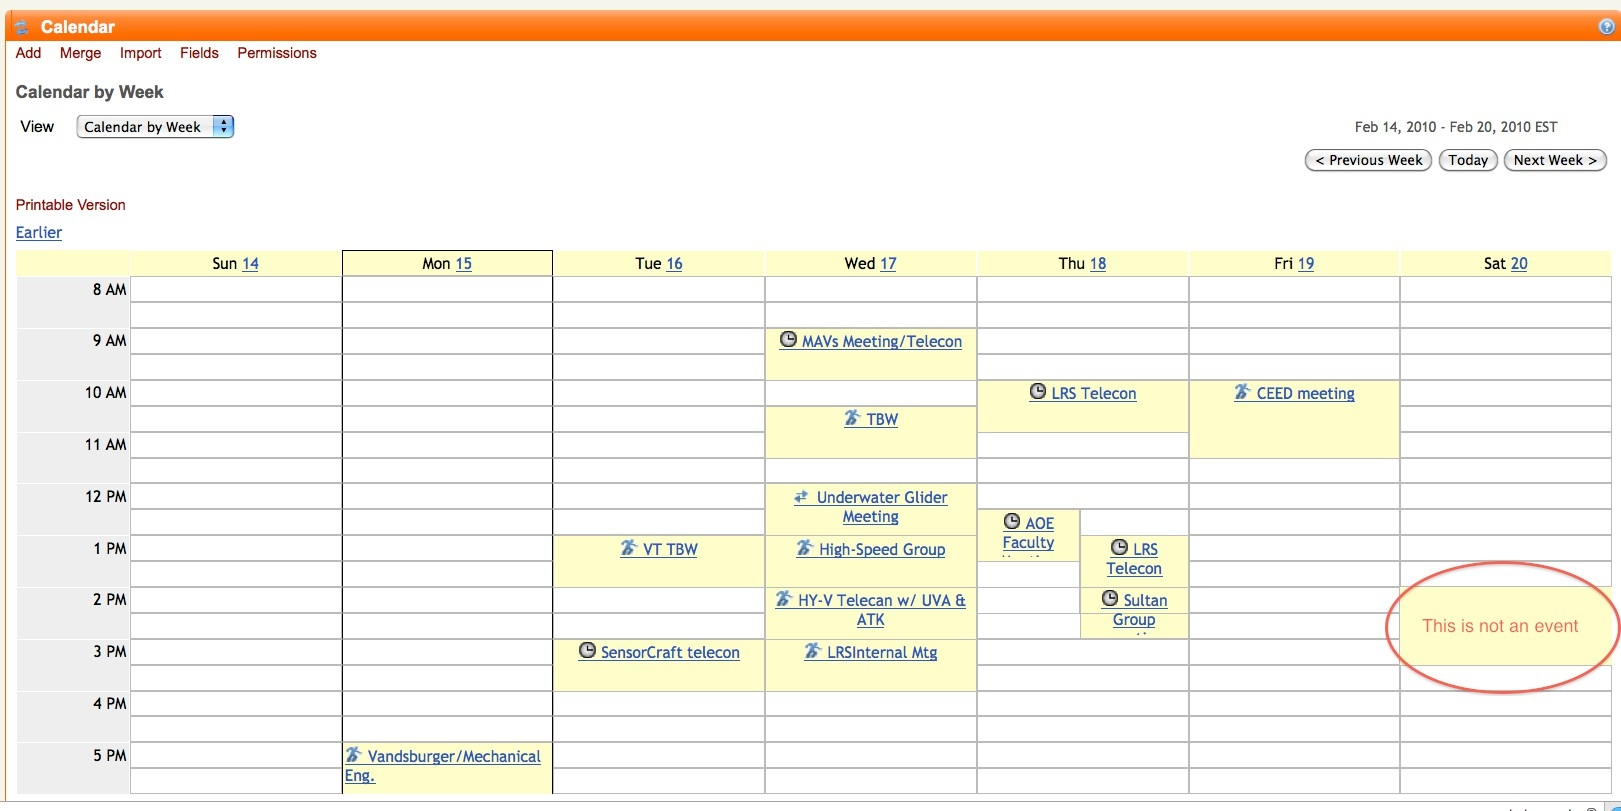 Free Printable Weekly Calendar With Time Slots Calendars 2016 With throughout Weekly Calendar Time Slots Printable